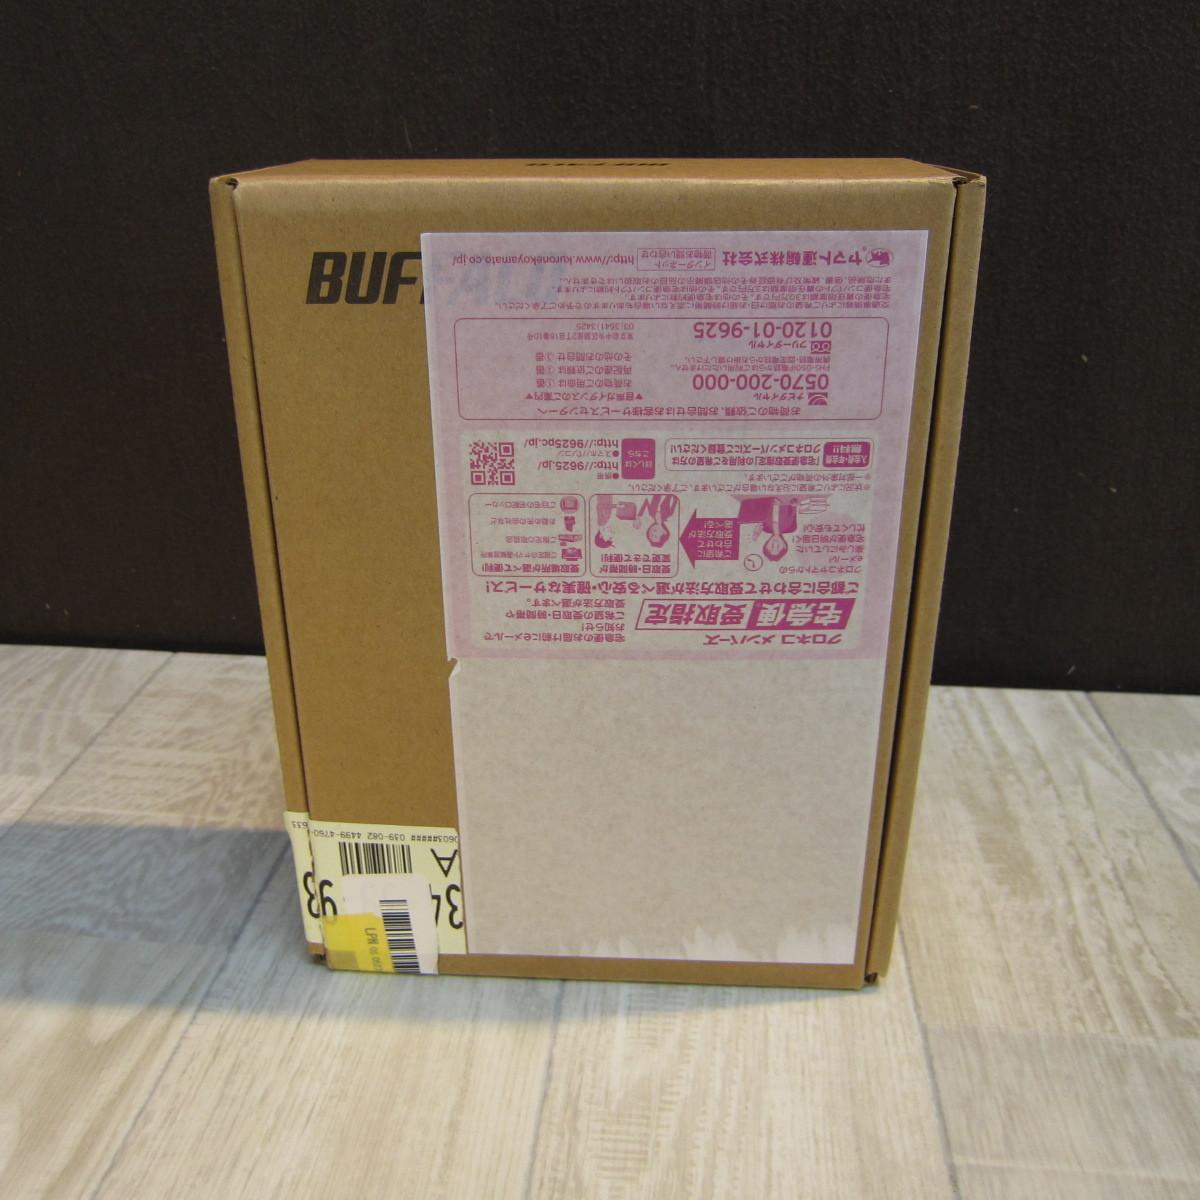 B6193【美品】バッファロー WiFi 無線LAN 中継機 Wi-Fi6 11ax / 11ac 1201+573Mbps ハイパワー 日本メーカー WEX-1800AX4EA/N